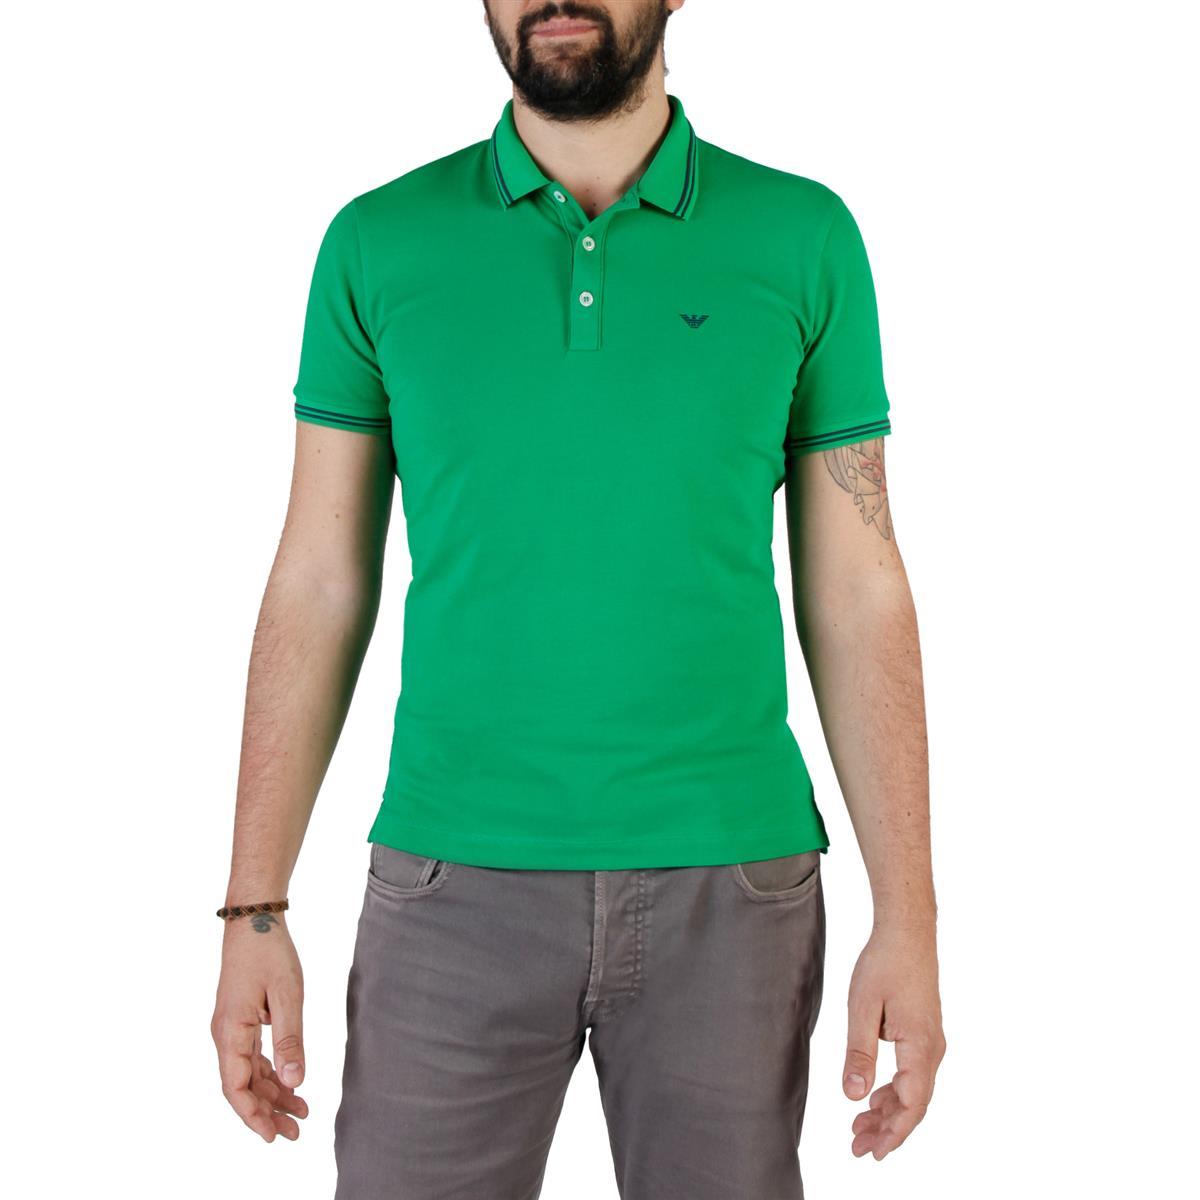 Emporio Armani koszulka męska polo T-shirt S